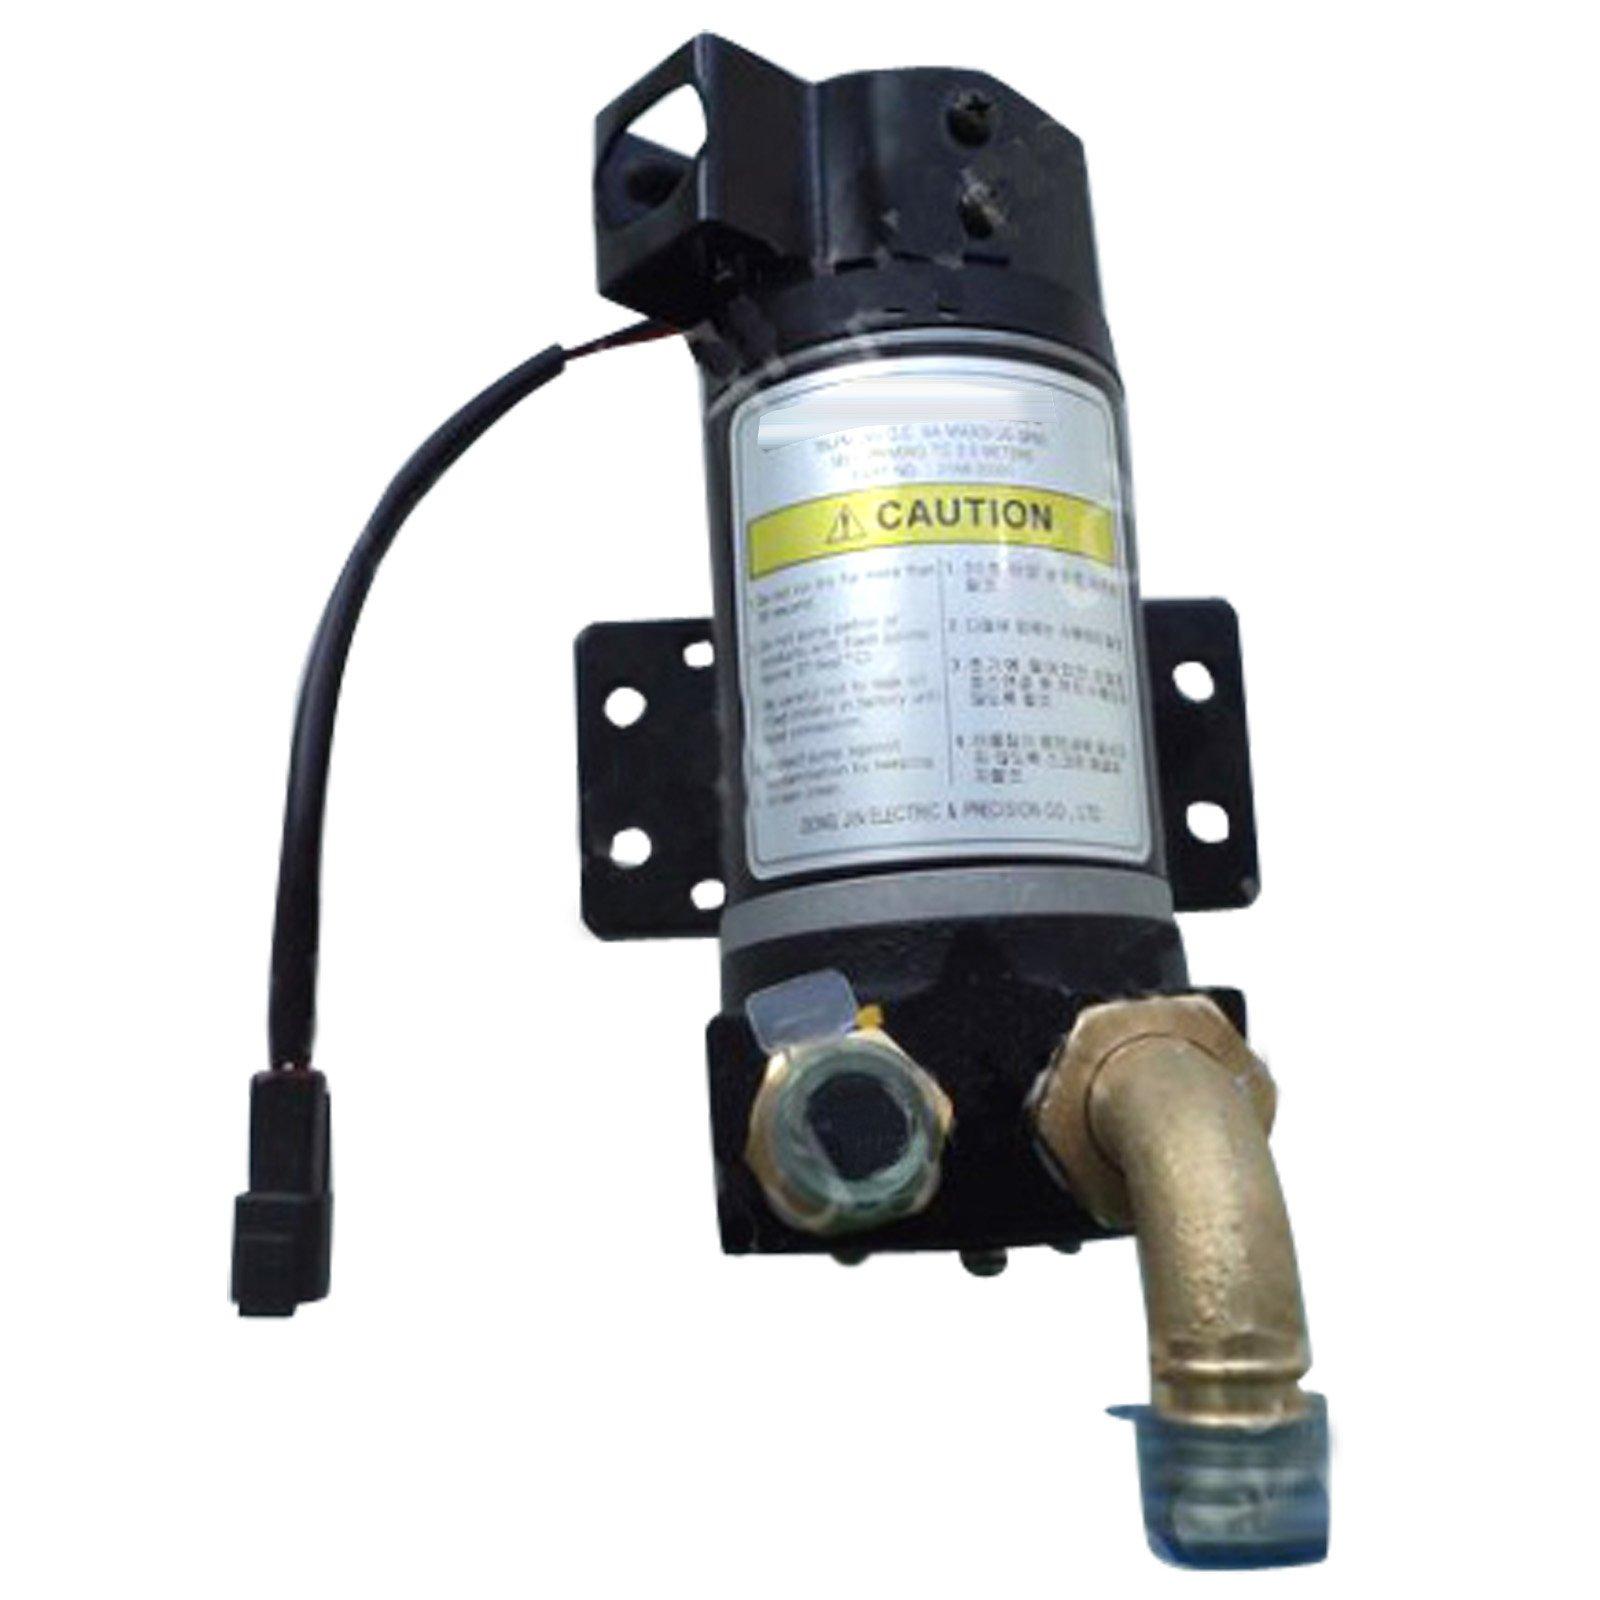 SINOCMP 21N6-20311 Excavator Fuel Filler Pump Assy for Hyundia Excavator R210LC-7 R110-7 R140LC-7 Parts, 3 Month Warranty